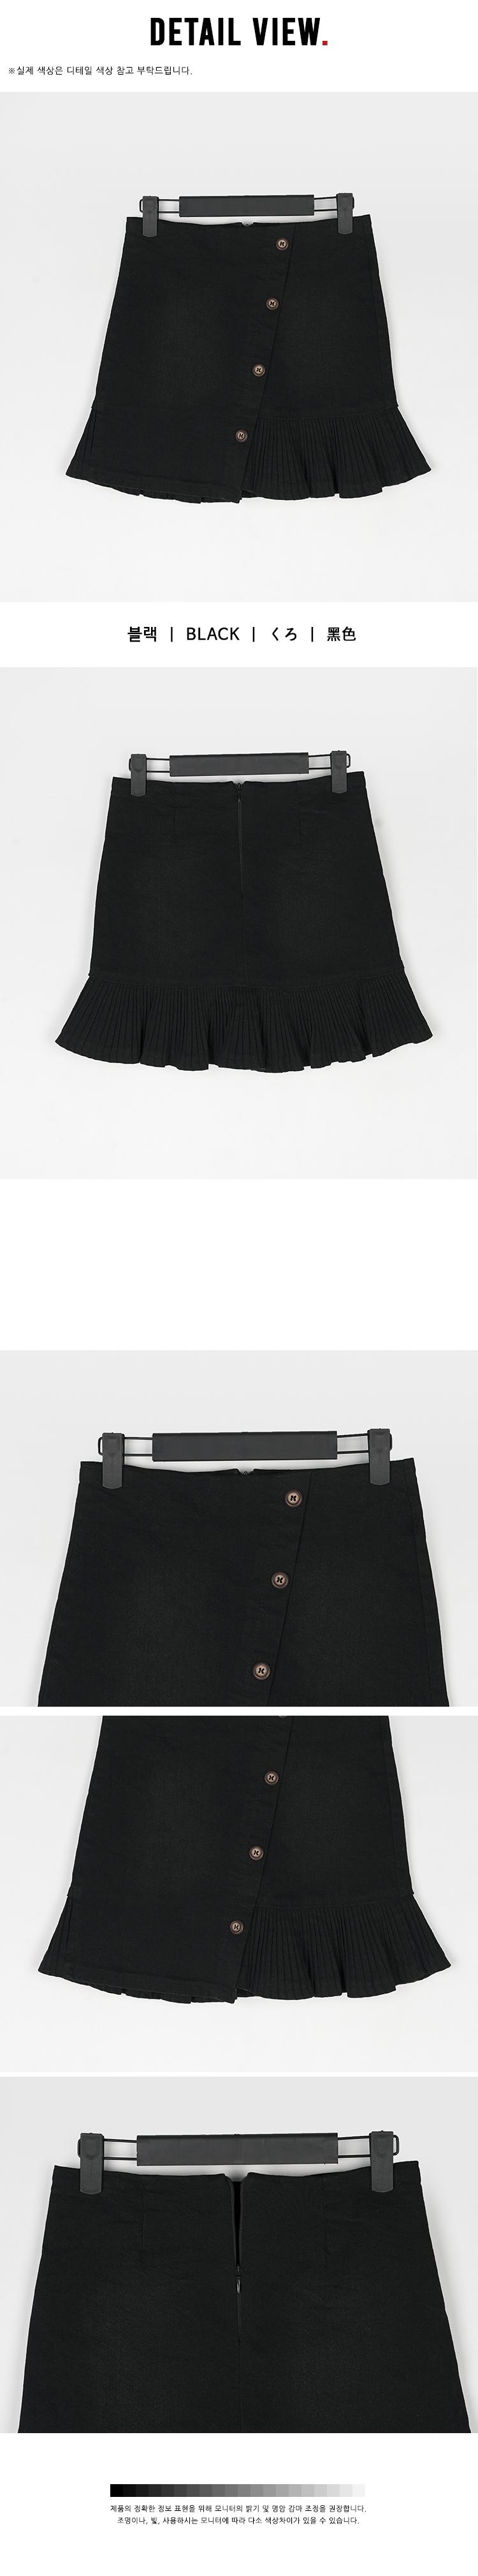 Panama button pleated mini skirt